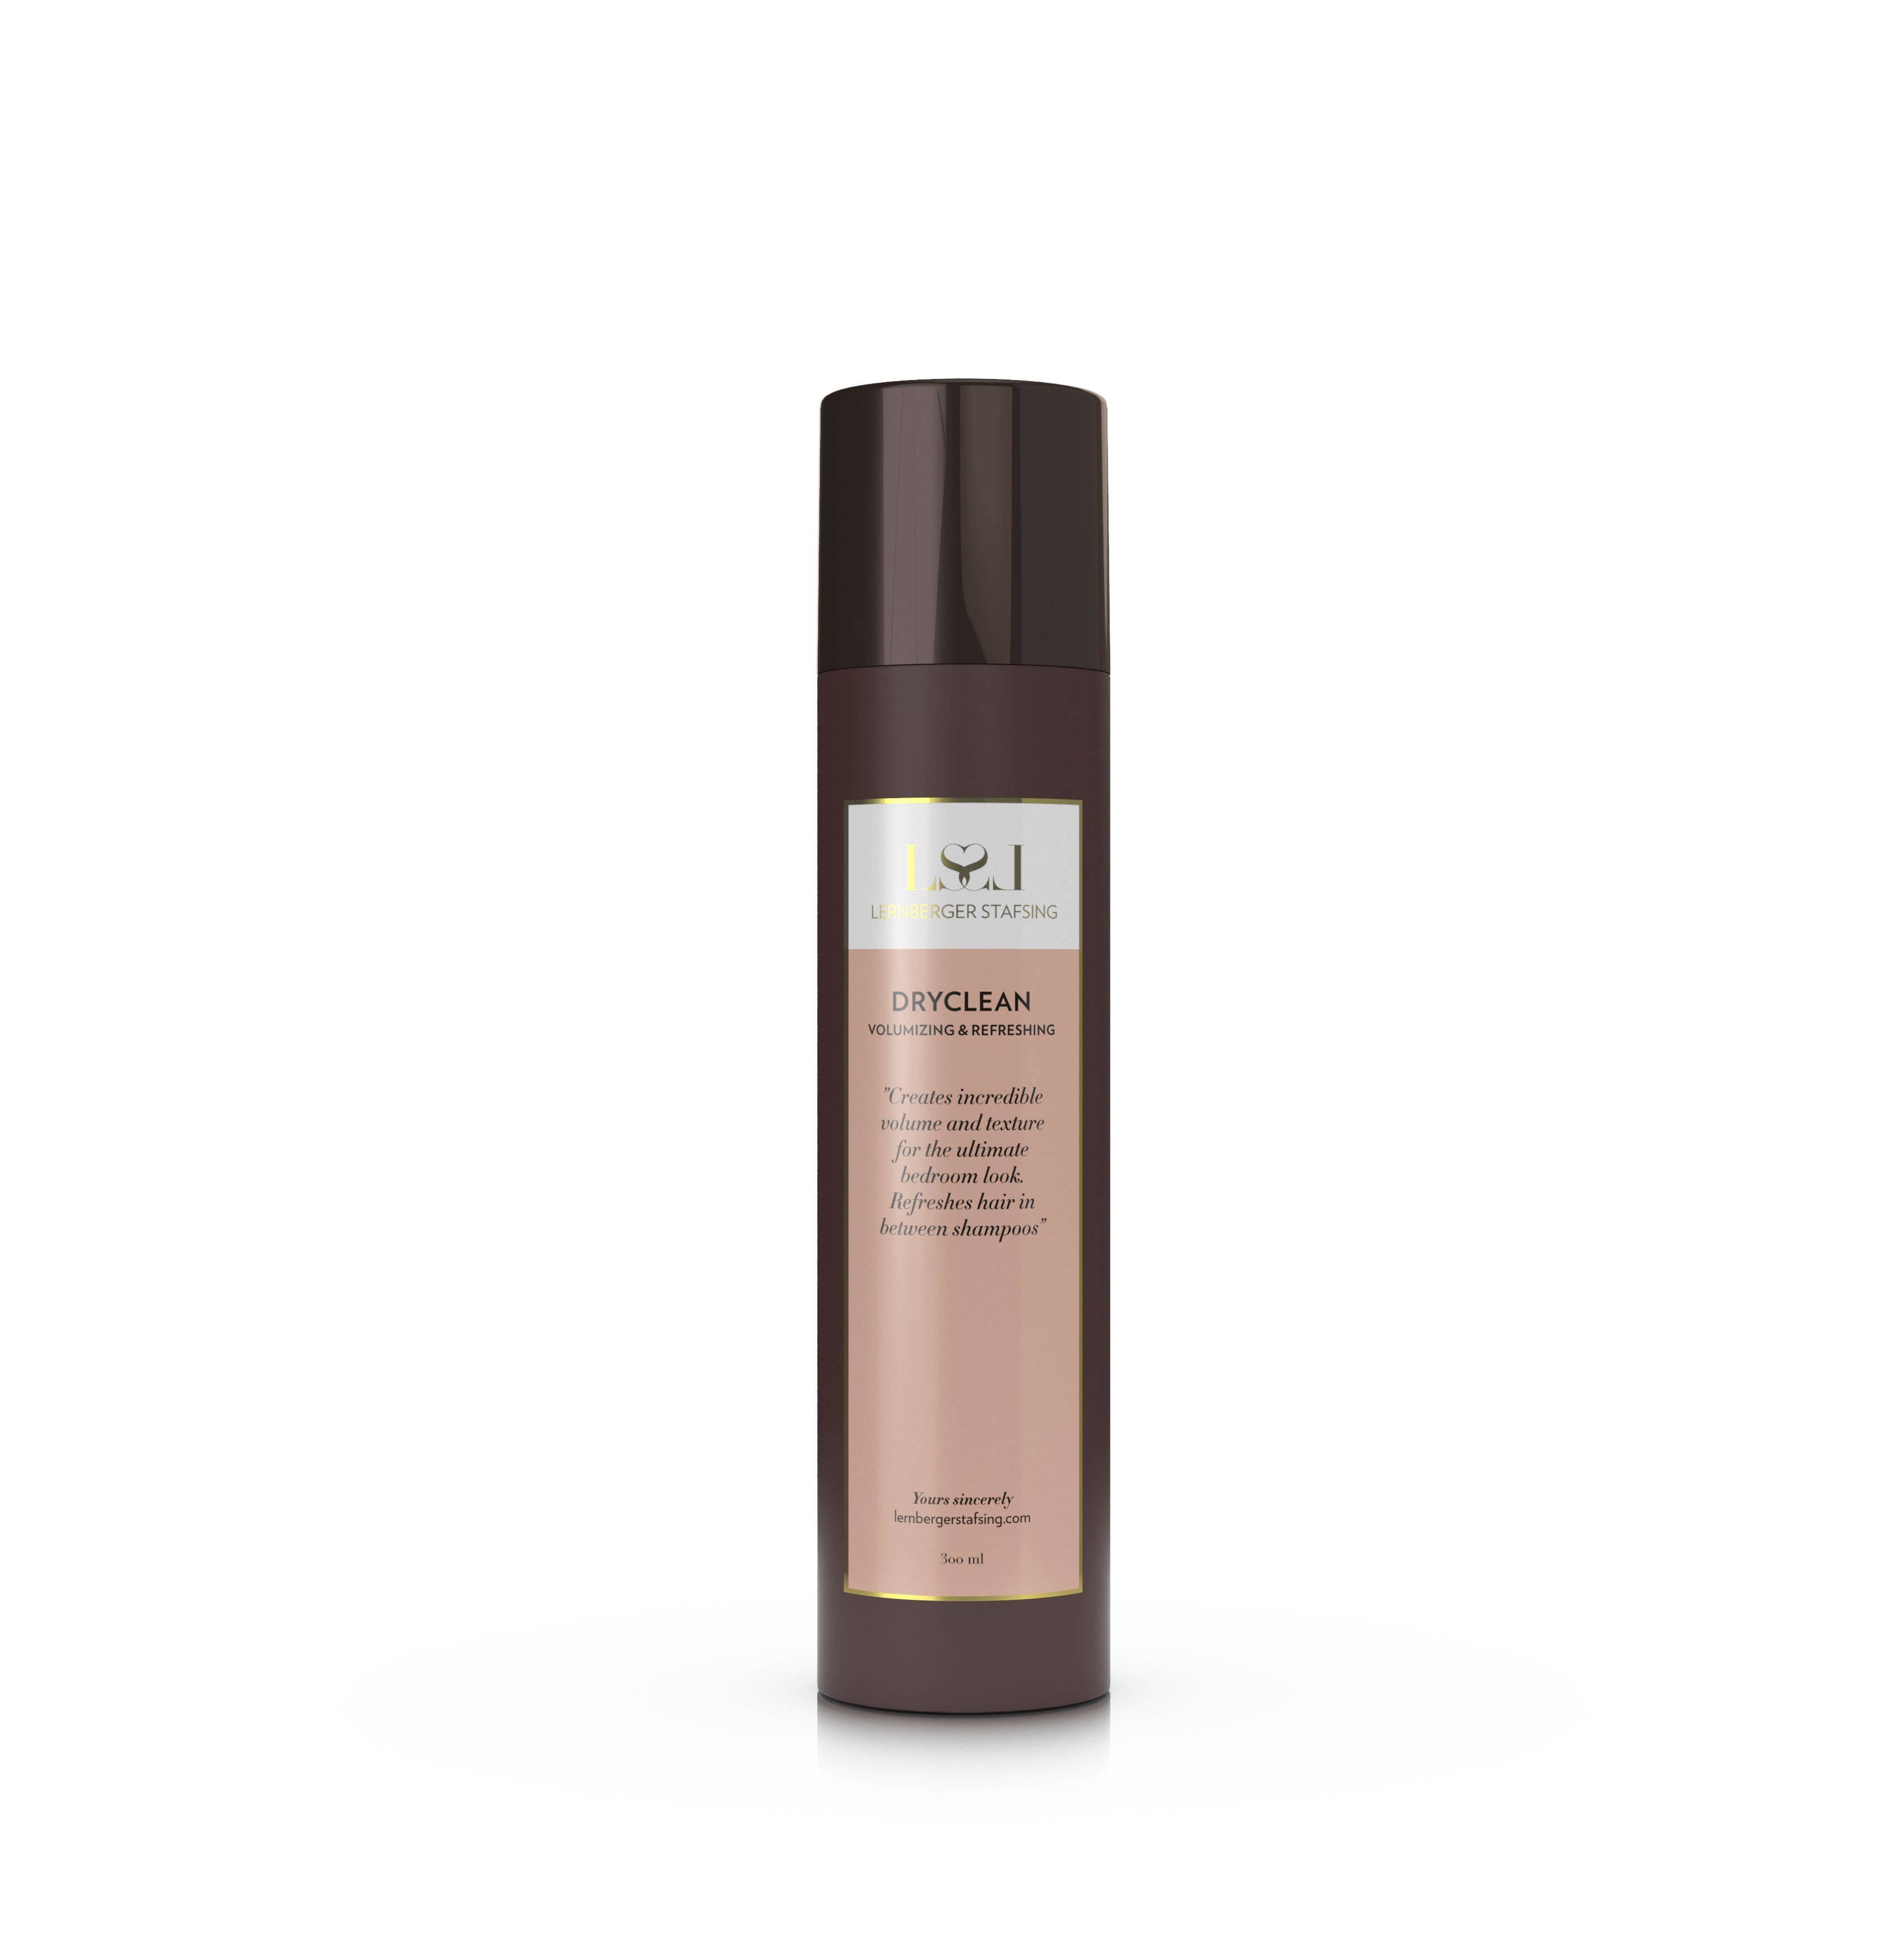 Lernberger Stafsing - Dry Shampoo Dryclean Light